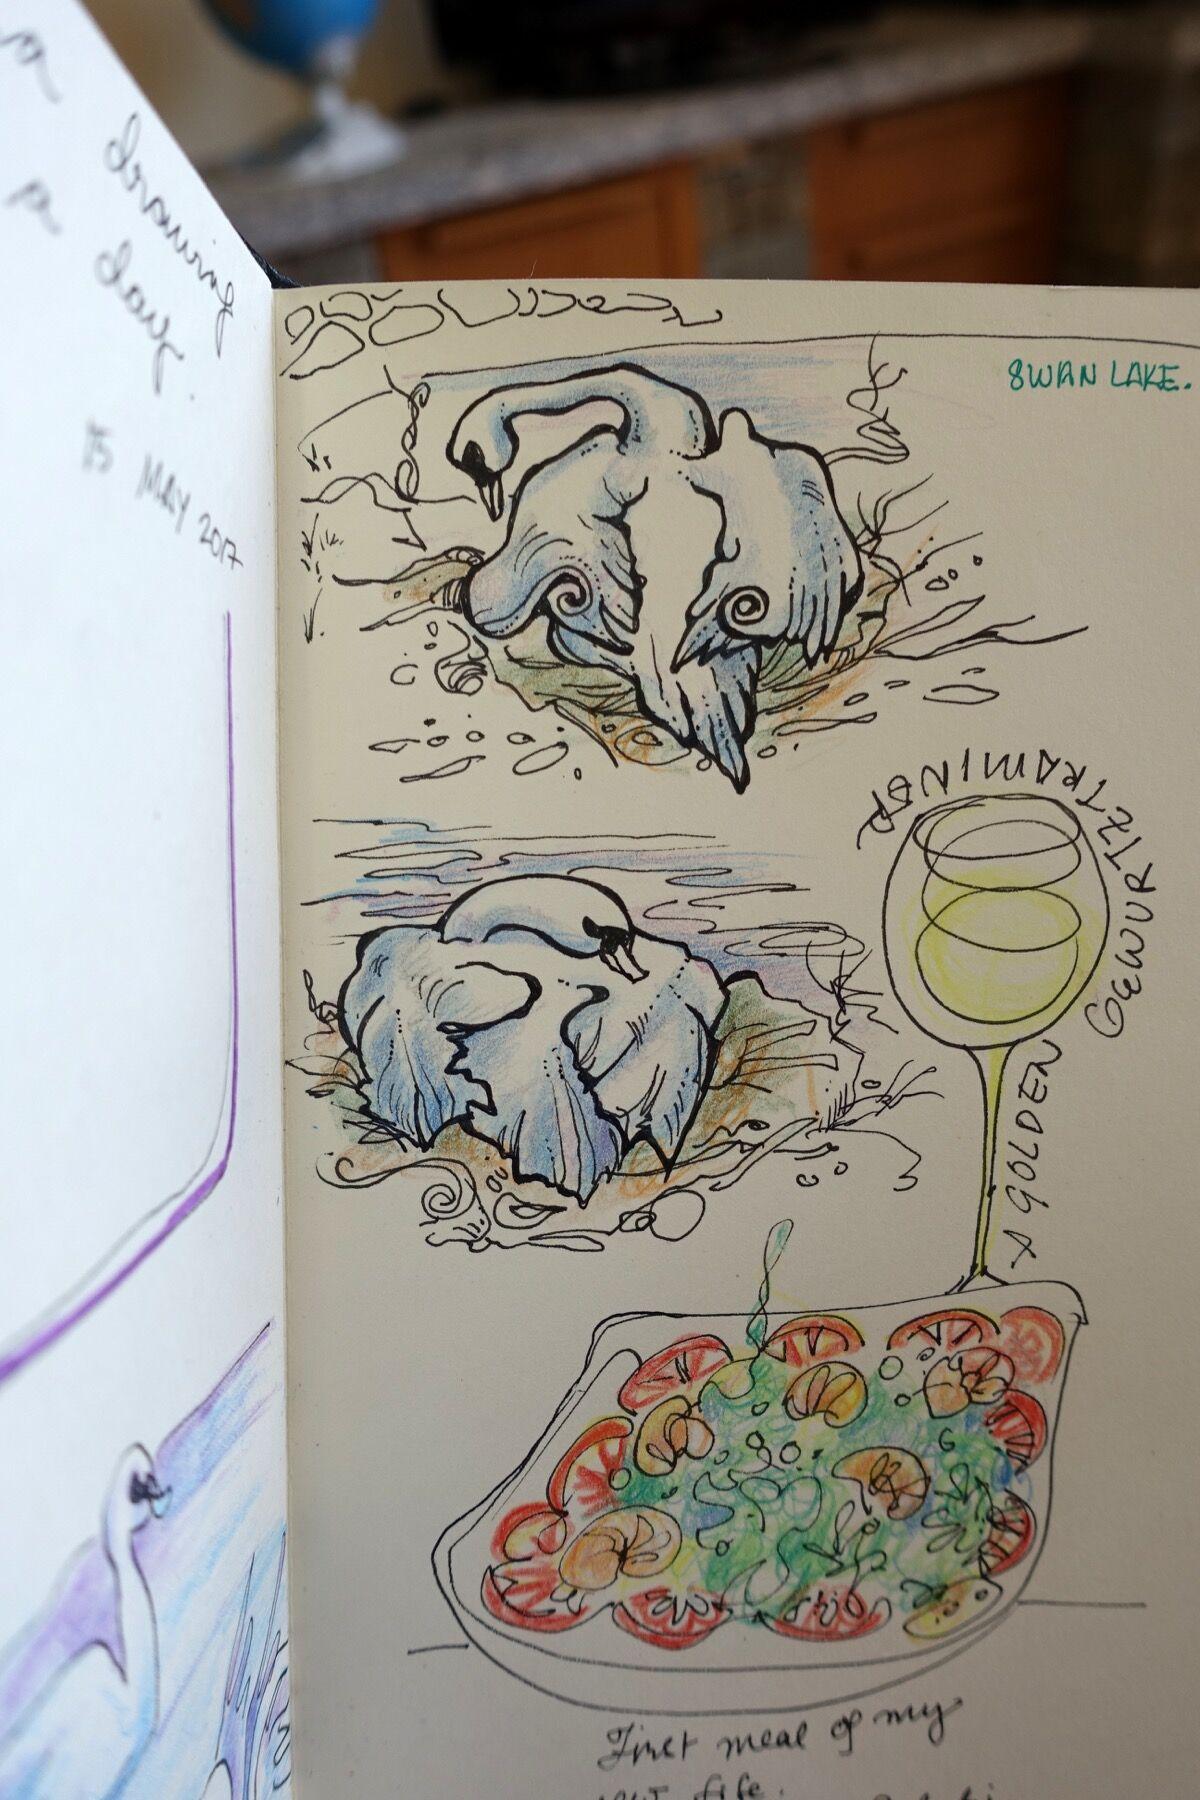 Pian di Spagna Swans. Sketch by Nikki Martinez. Courtesy of the artist.